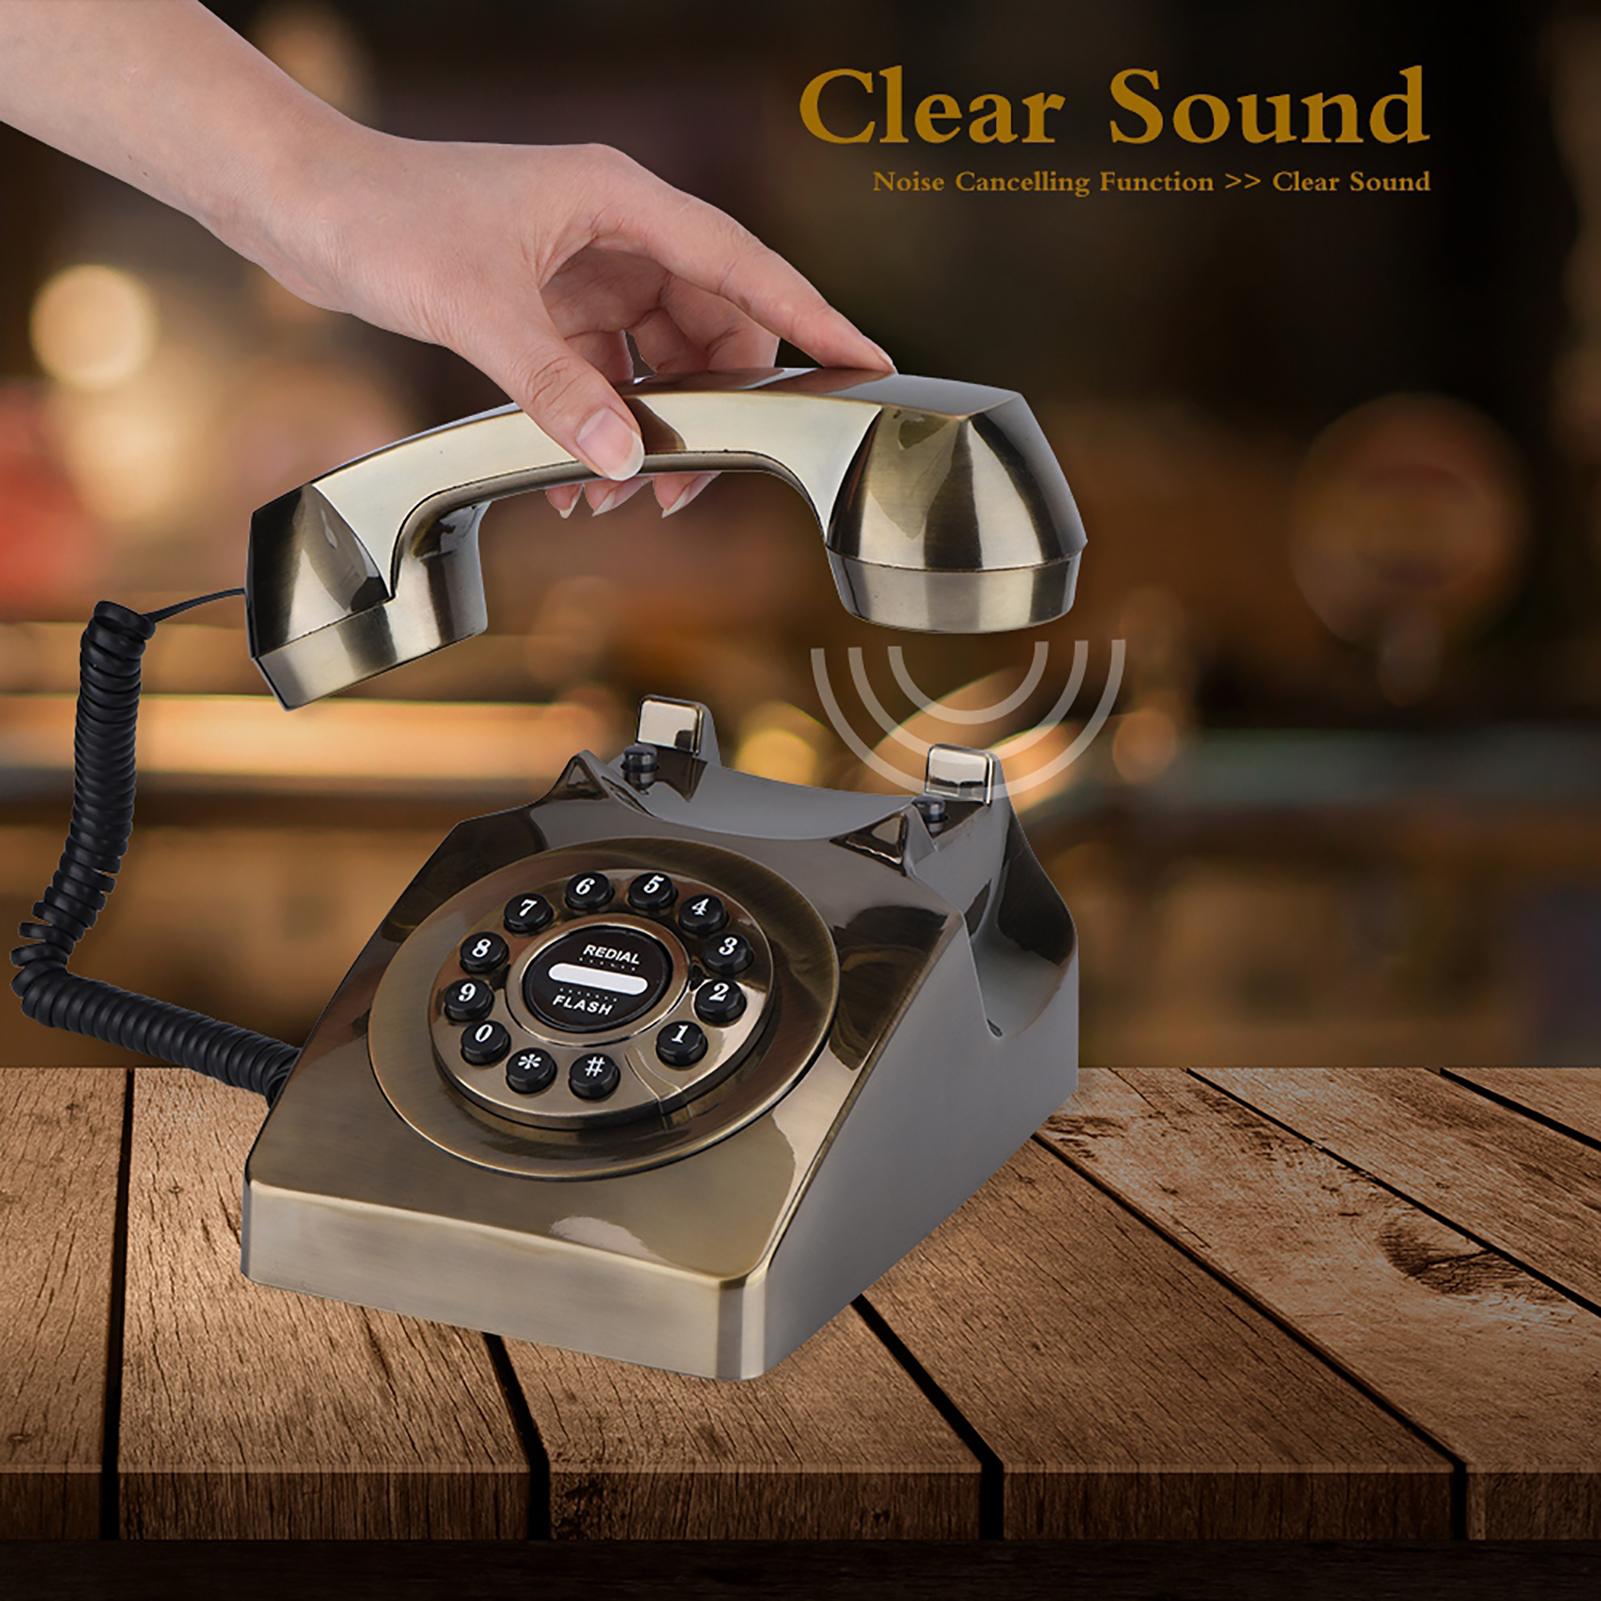 Rotary-Disc-Retro-Phones-Old-Retro-Vintage-Telephone-Home-Desktop-Landline-Phone thumbnail 13